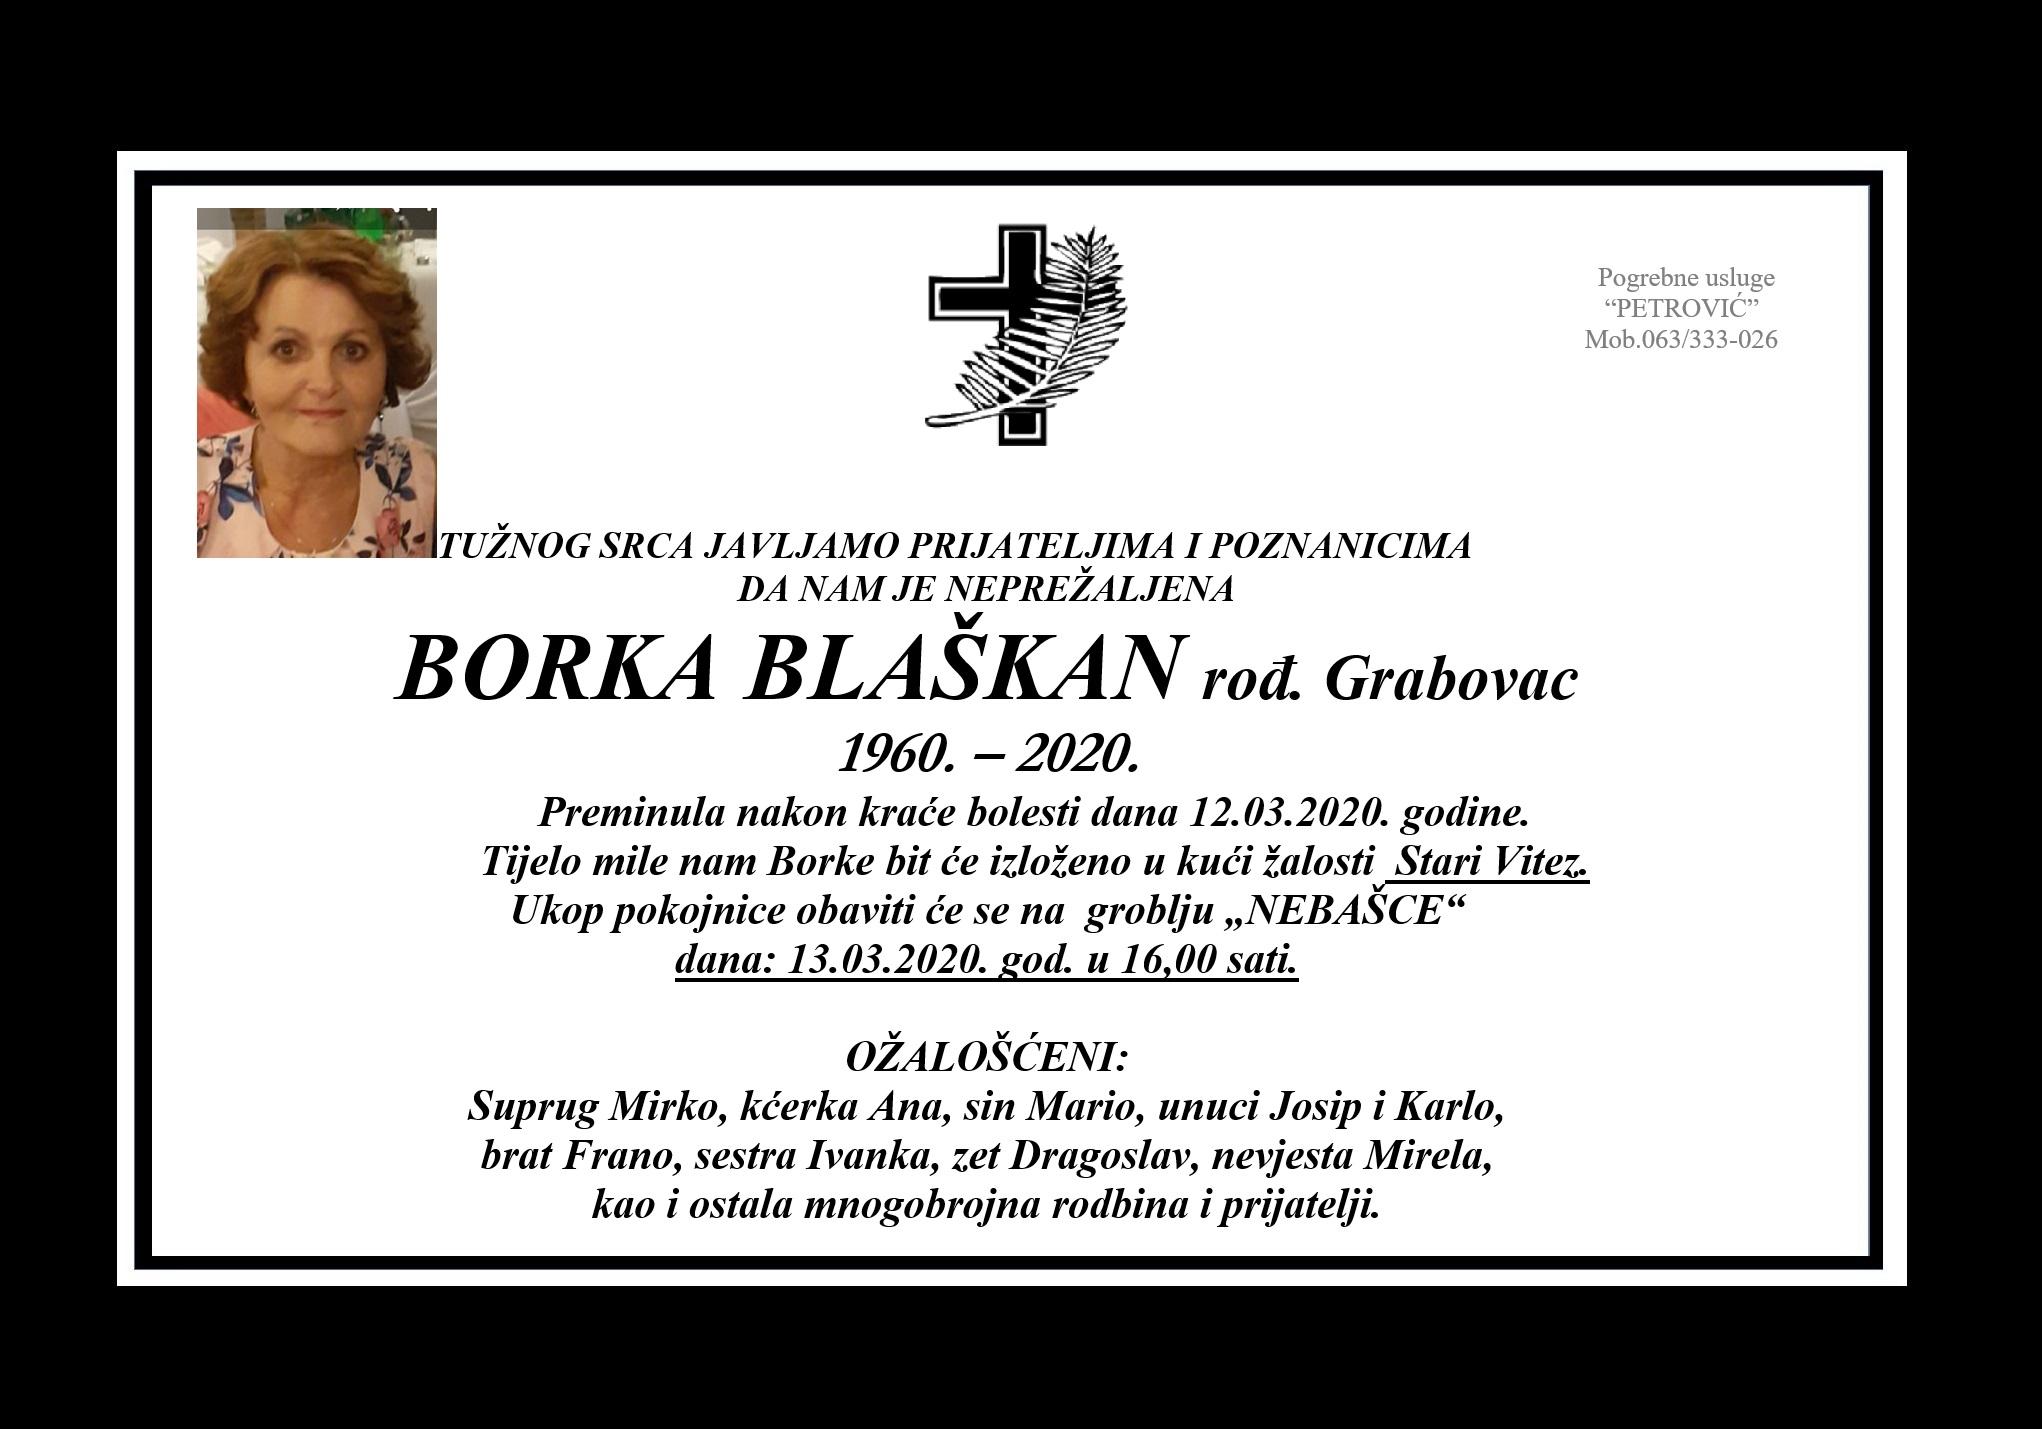 Borka Blaškan, rođ. Grabovac